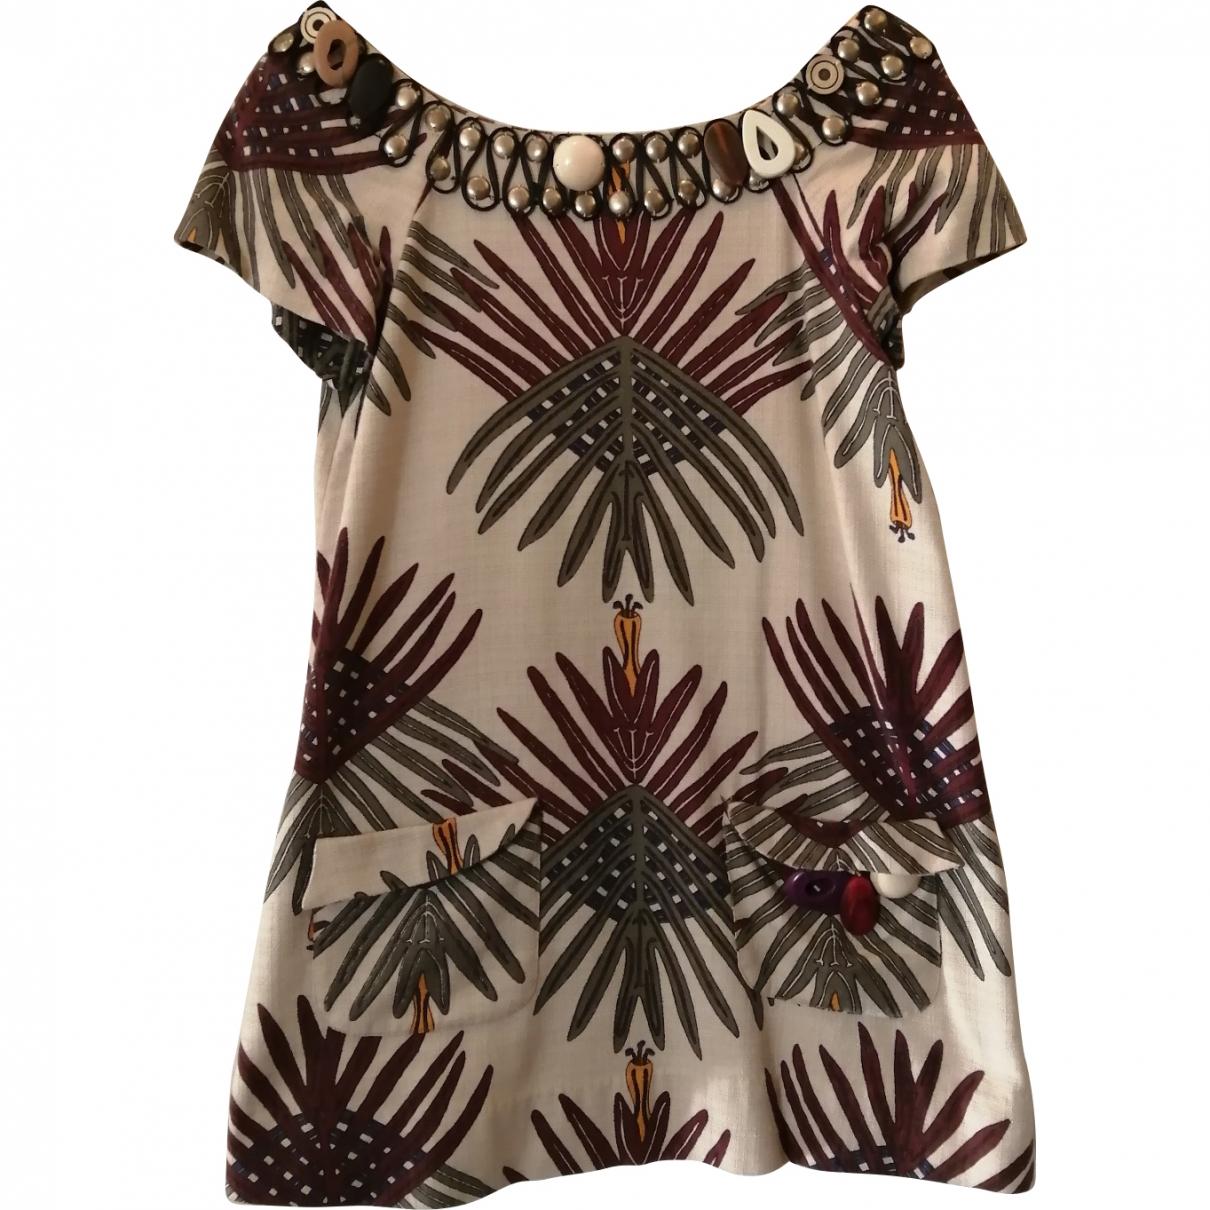 Hoss Intropia \N Ecru Cotton dress for Women 38 FR